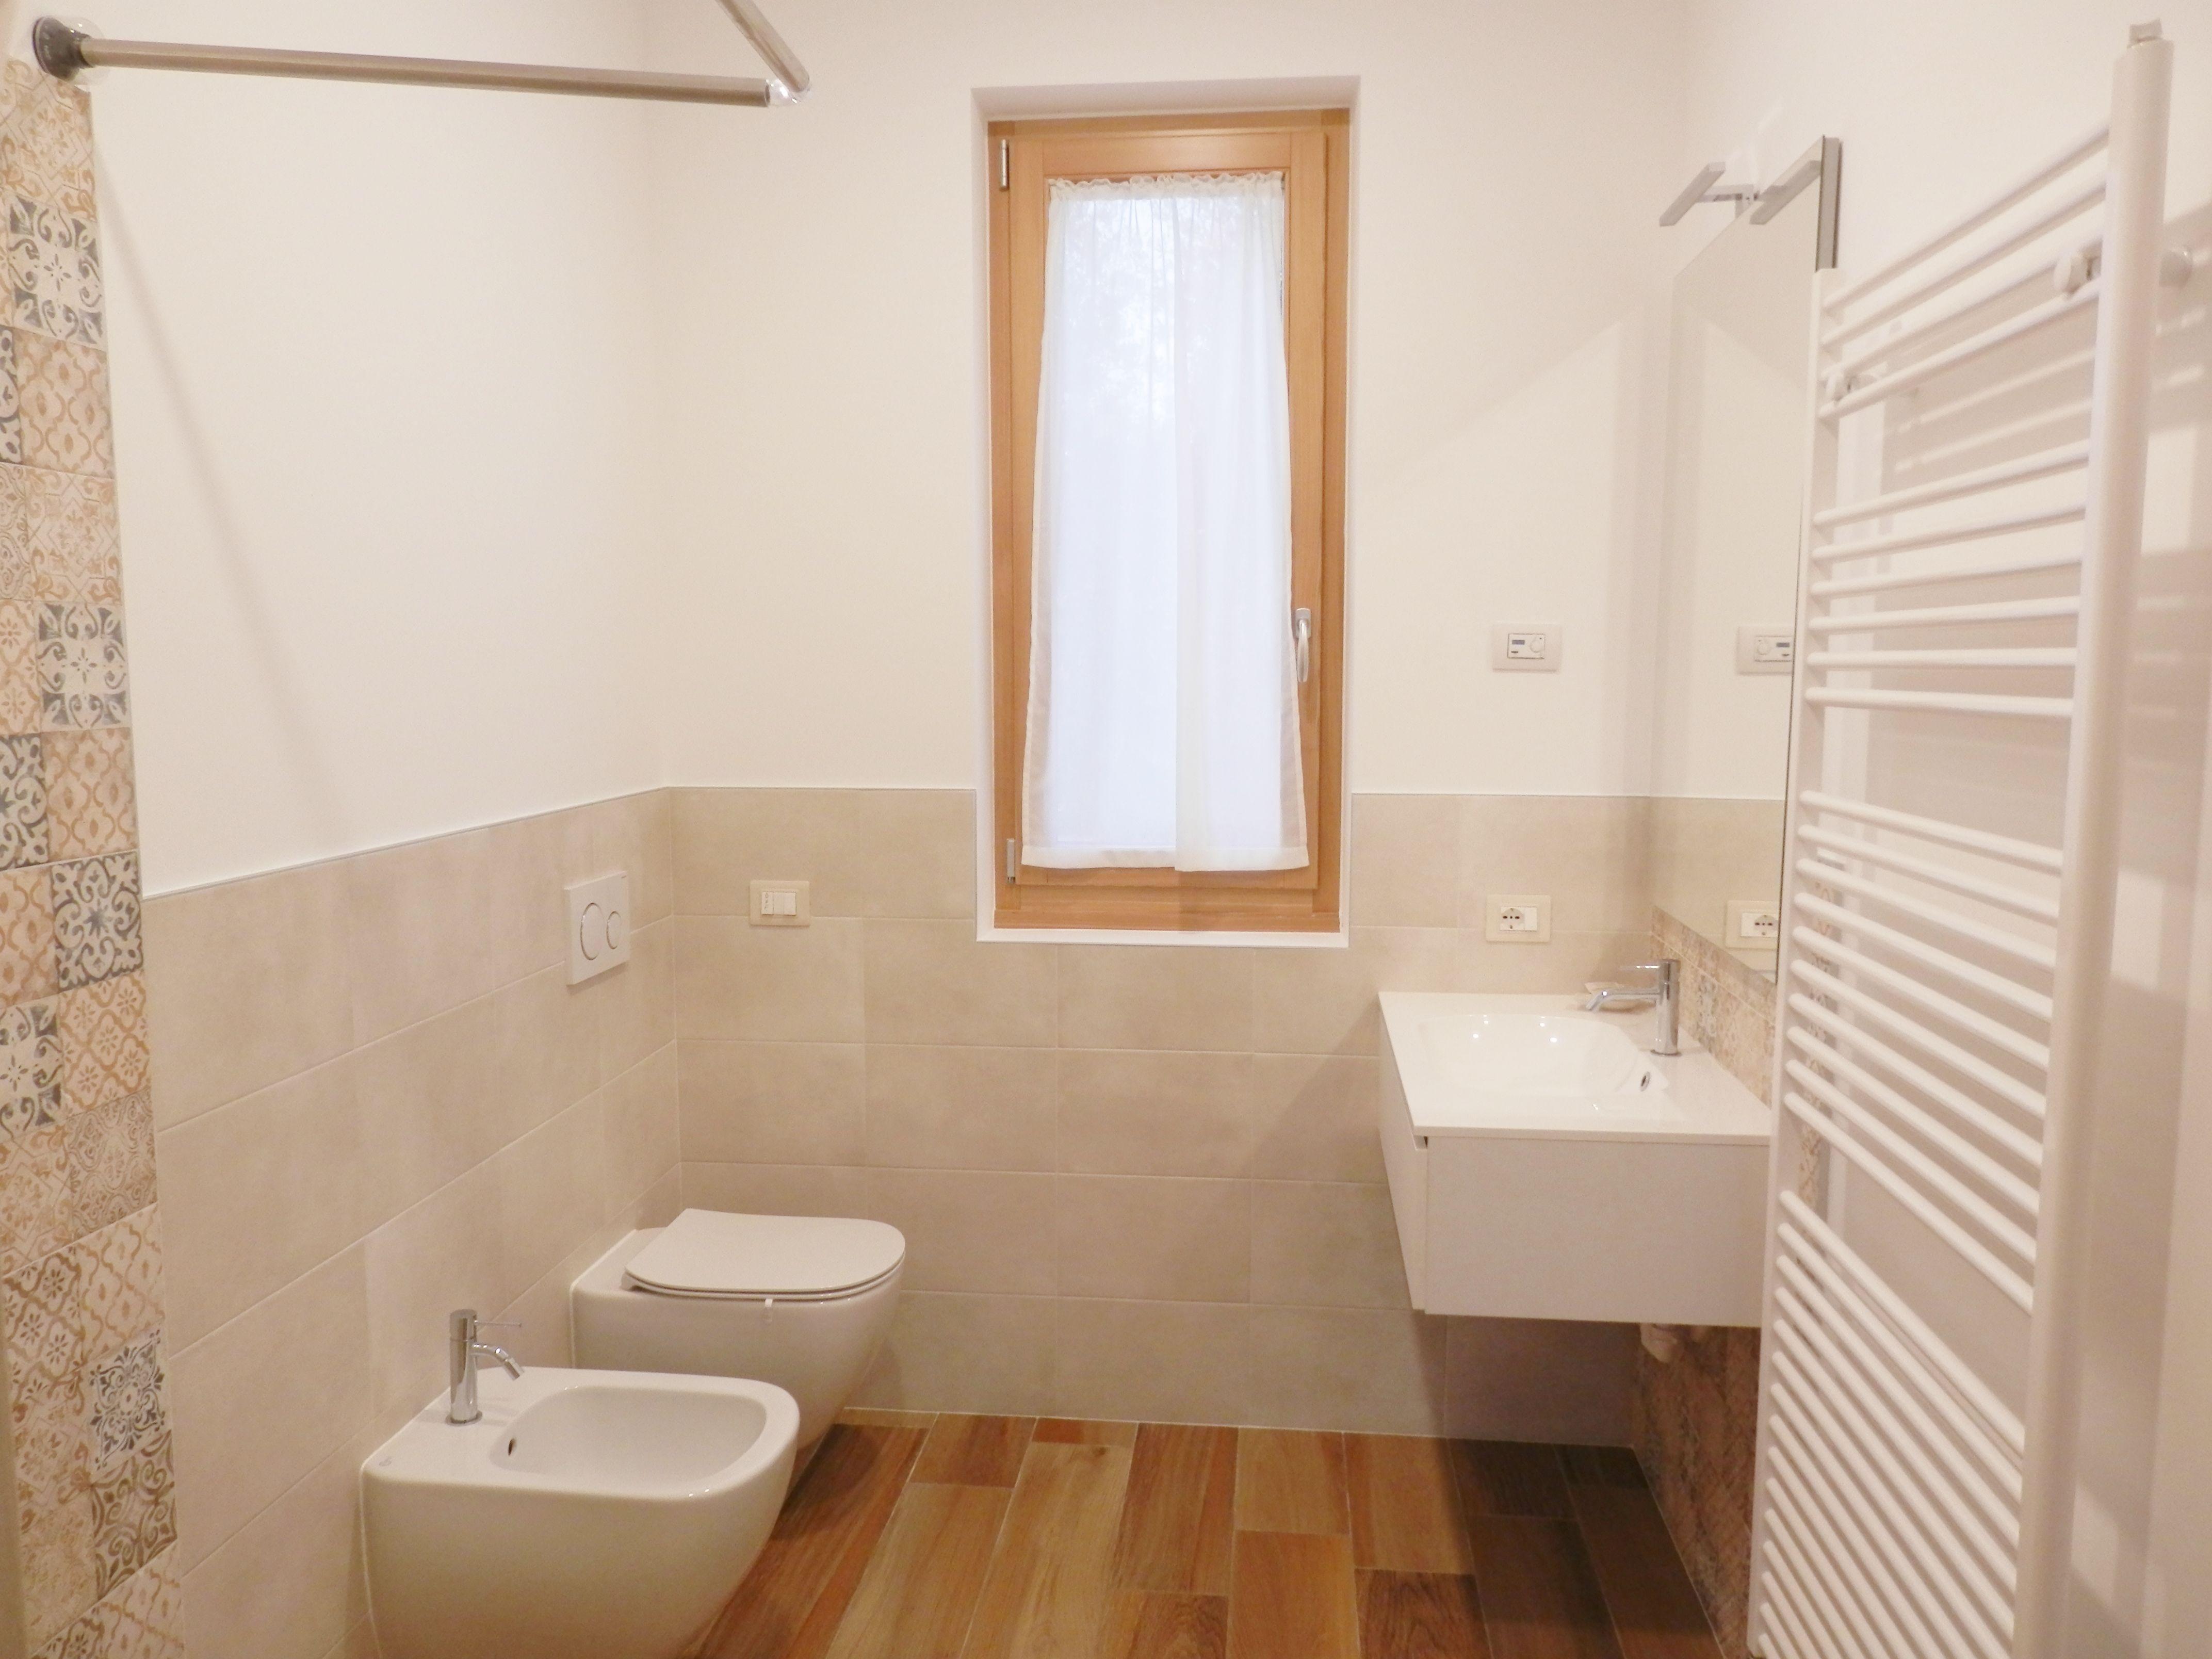 Casaliva two-room apartment | Agriturismo Fioralba Lake Garda